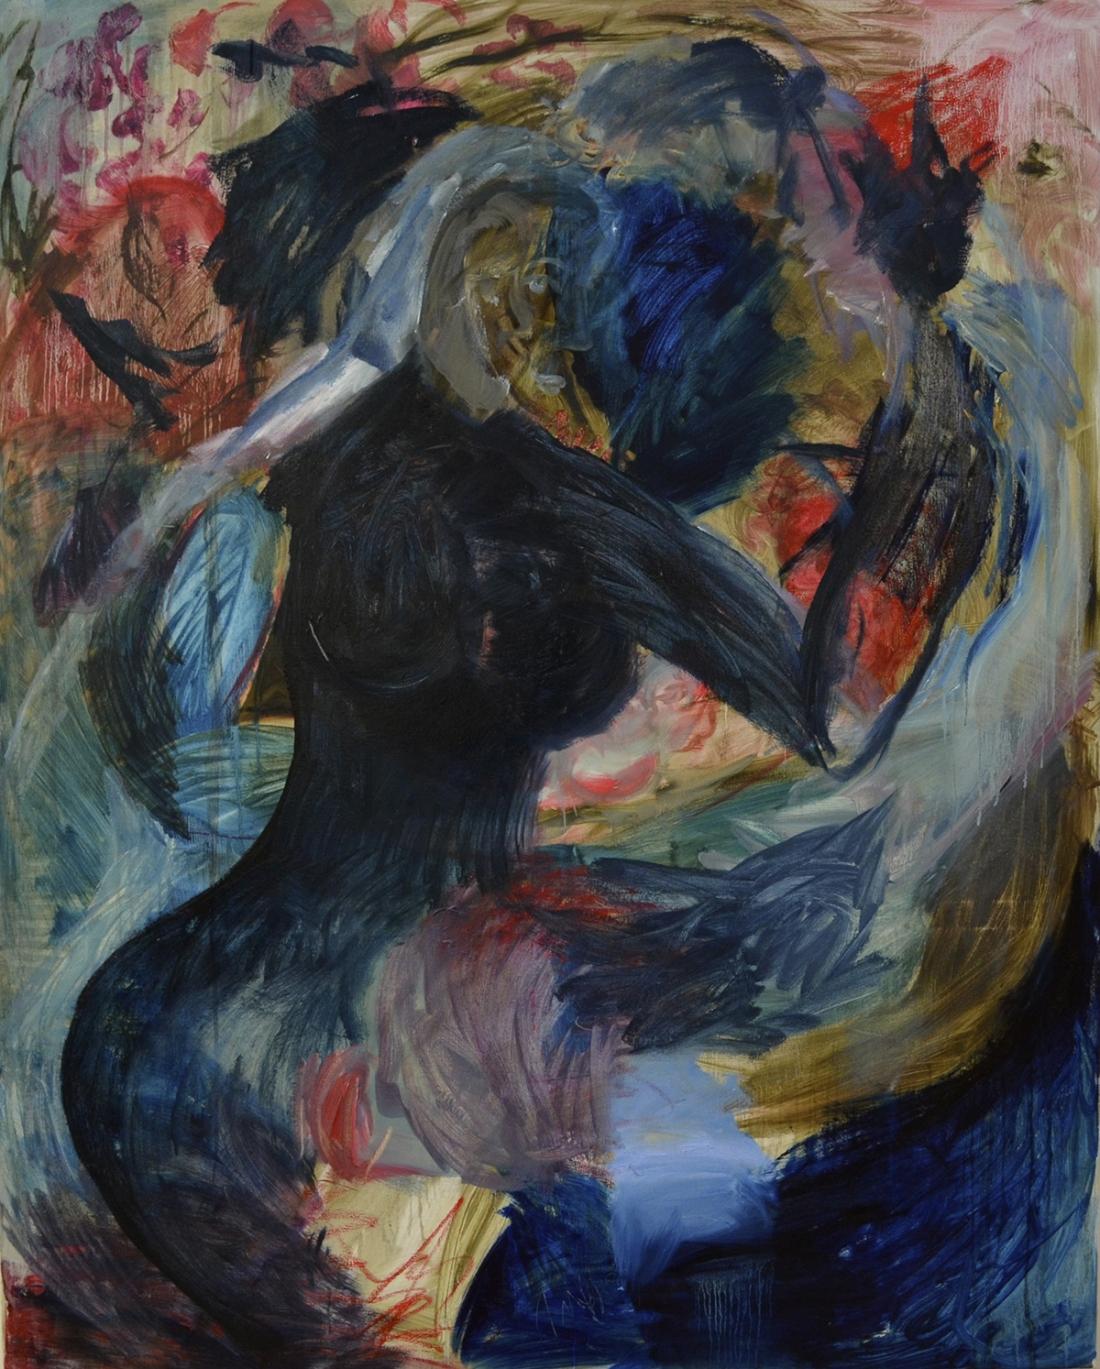 Noor Qayyum, To Ripen, 2017